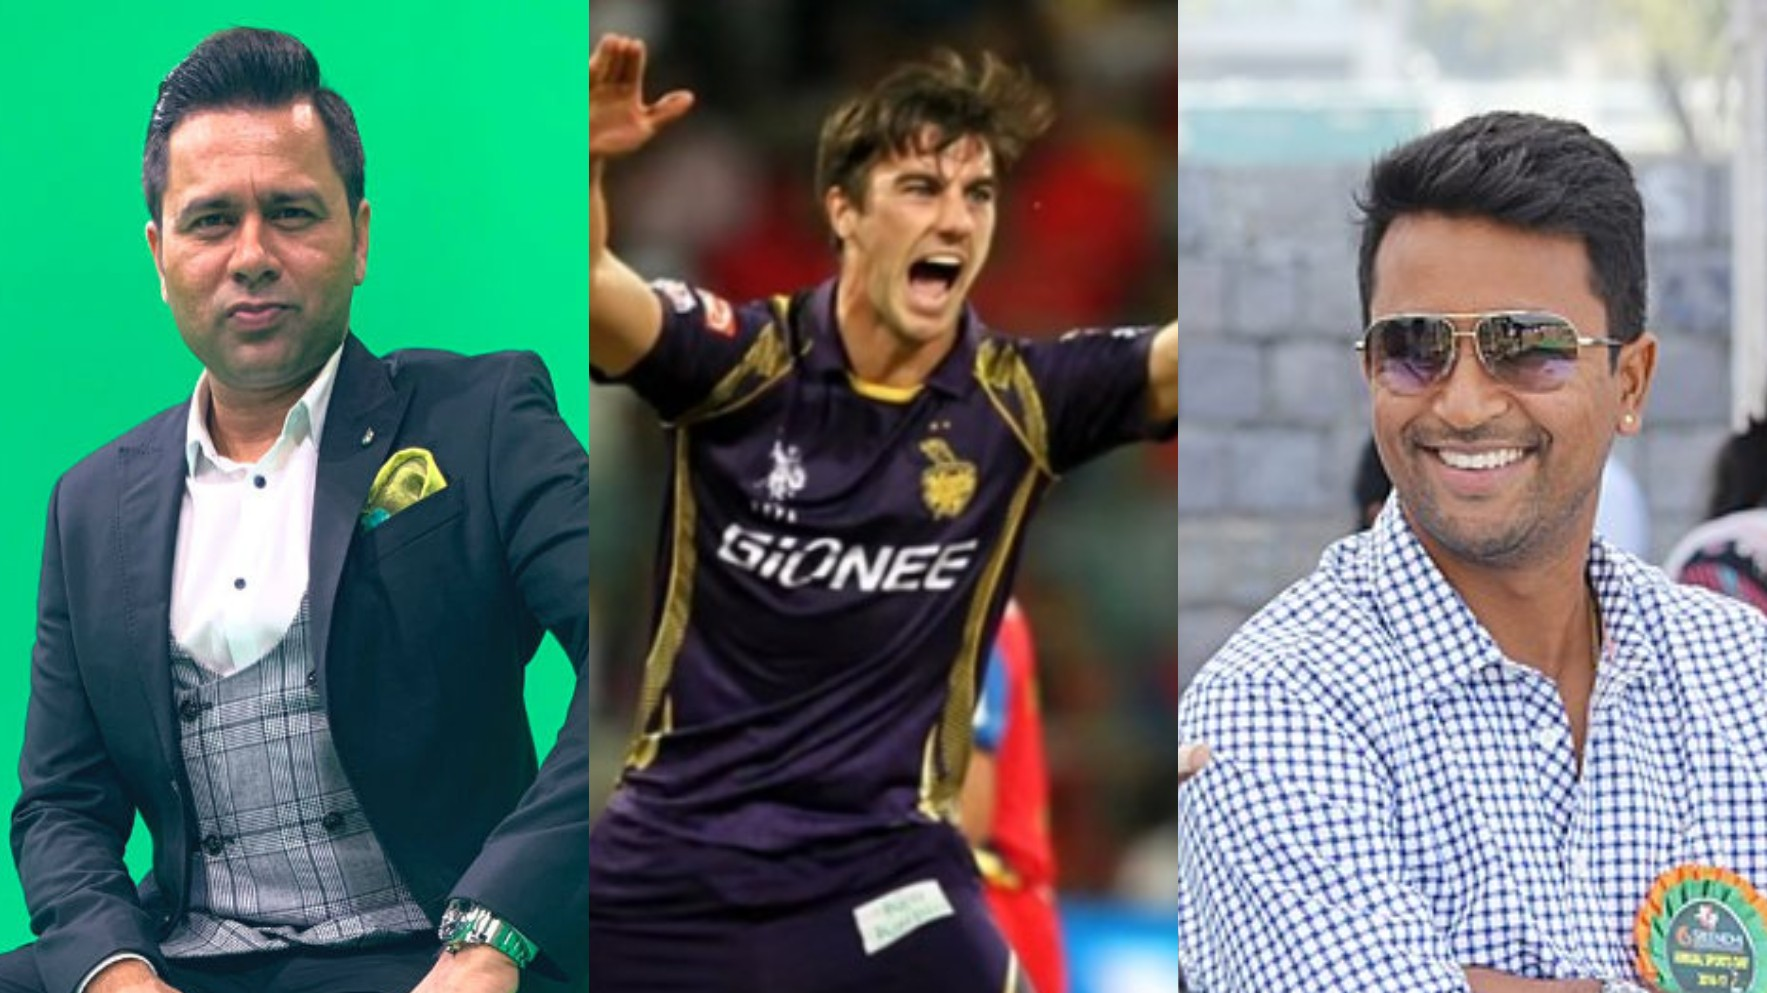 IPL 2020: Twitterverse roasts Pat Cummins as he goes for 49 runs in 3 overs as MI make 195/5